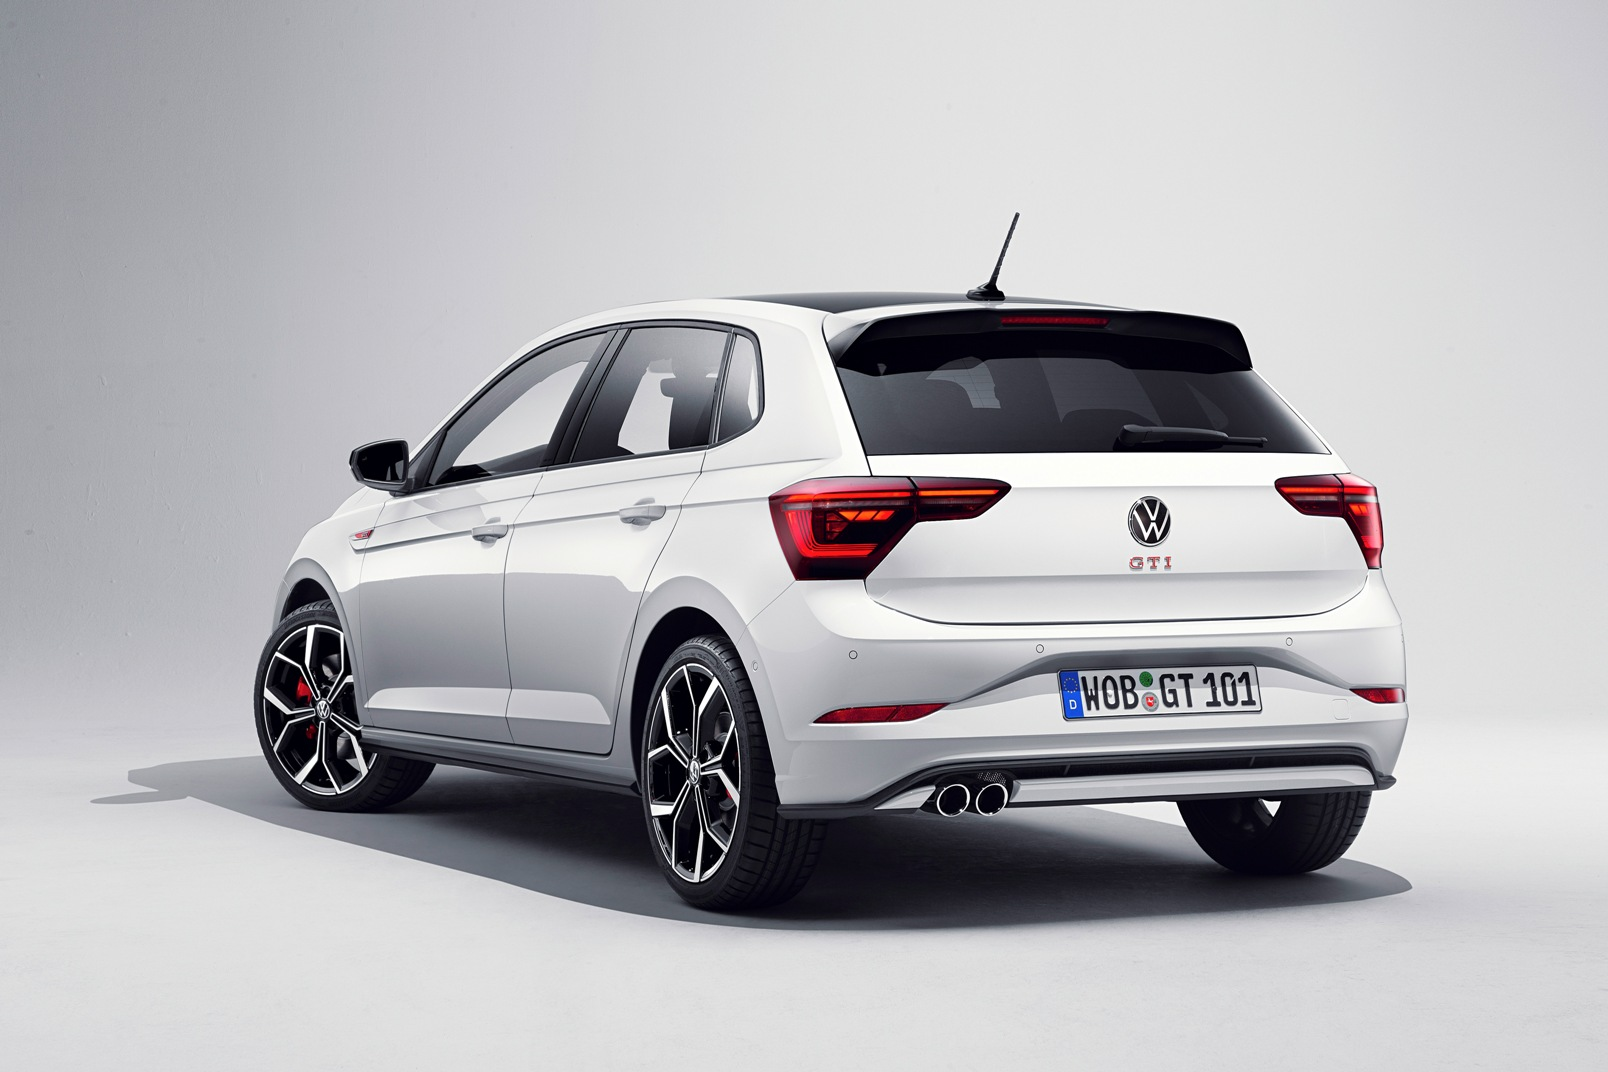 Volkswagen Polo Gti 2022 (8)